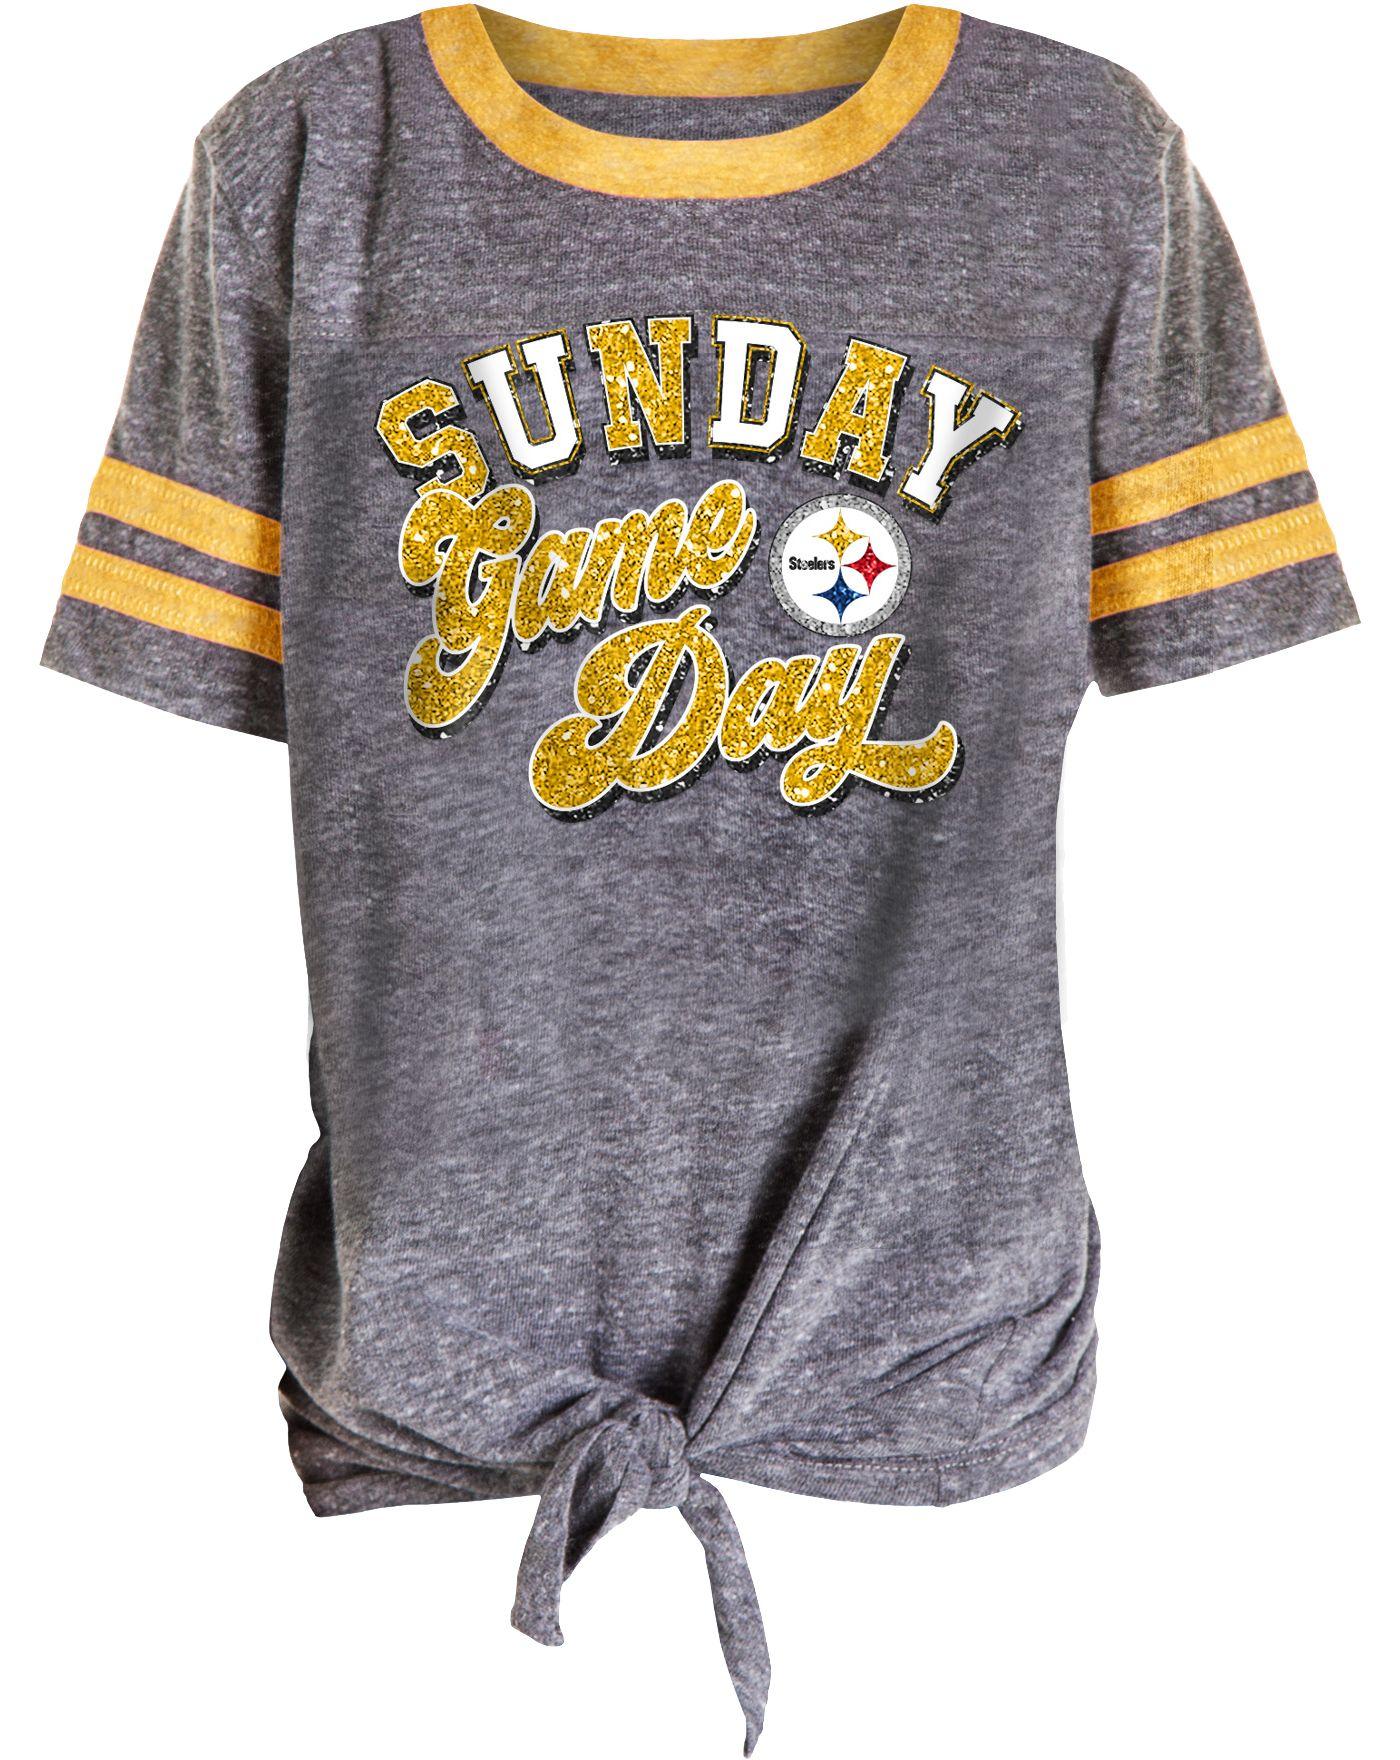 NFL Team Apparel Girls' Pittsburgh Steelers Tie Grey T-Shirt